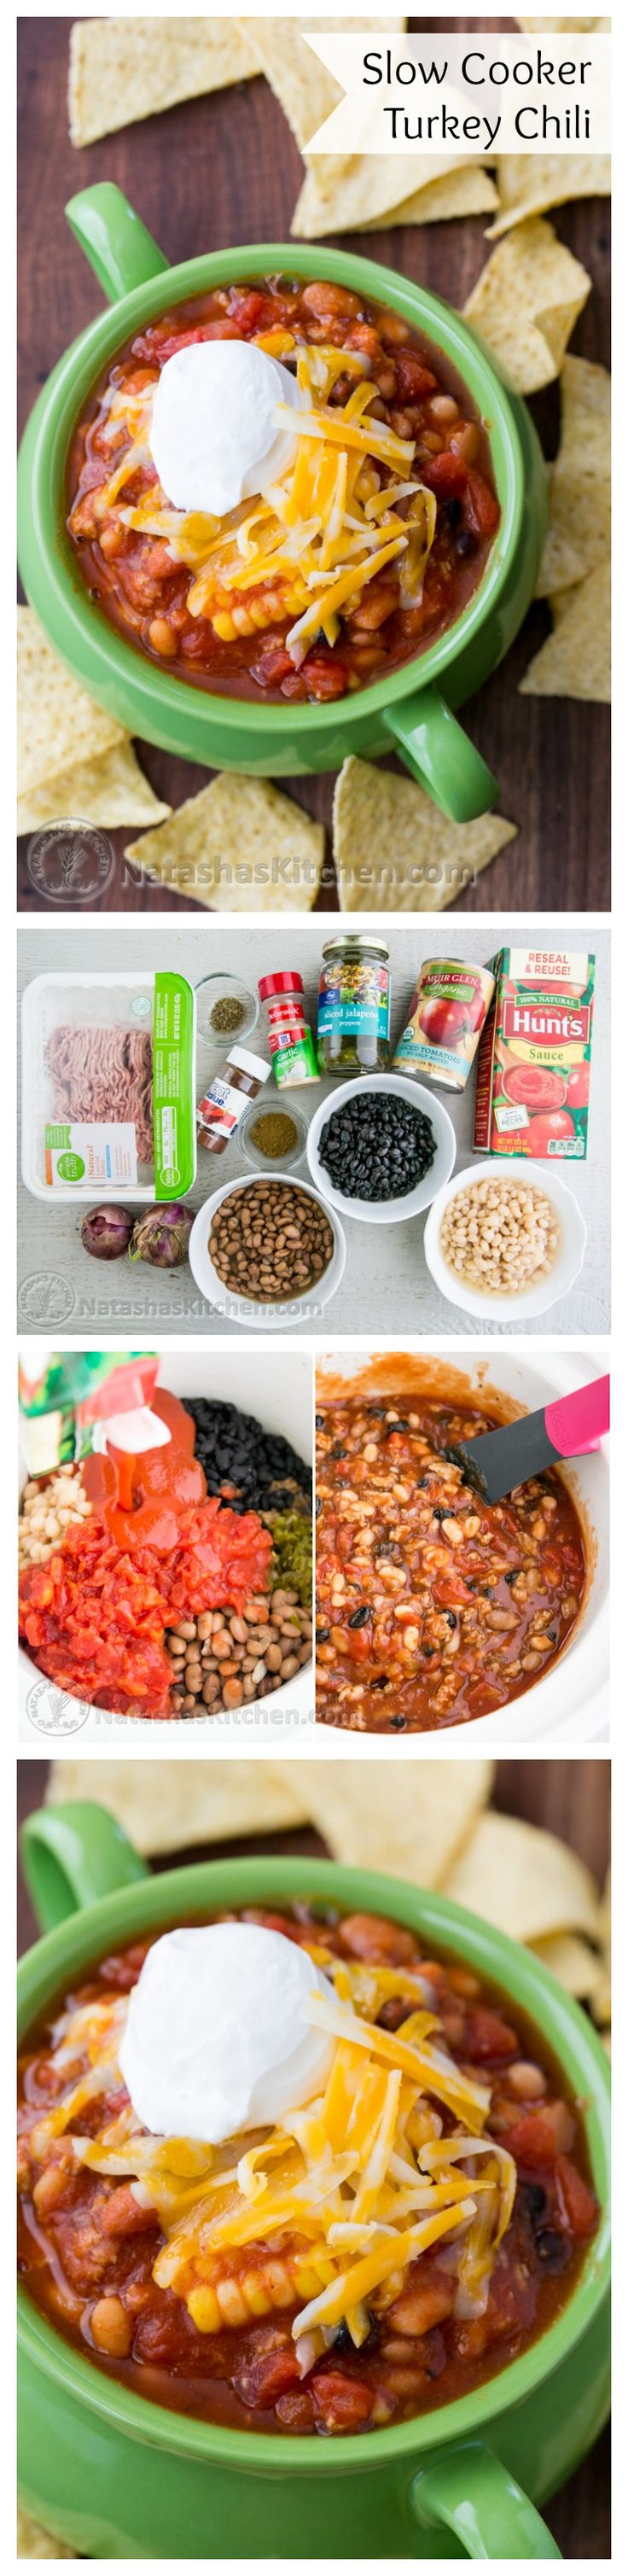 Slow Cooker Turkey Chili Recipe from @natashaskitchen